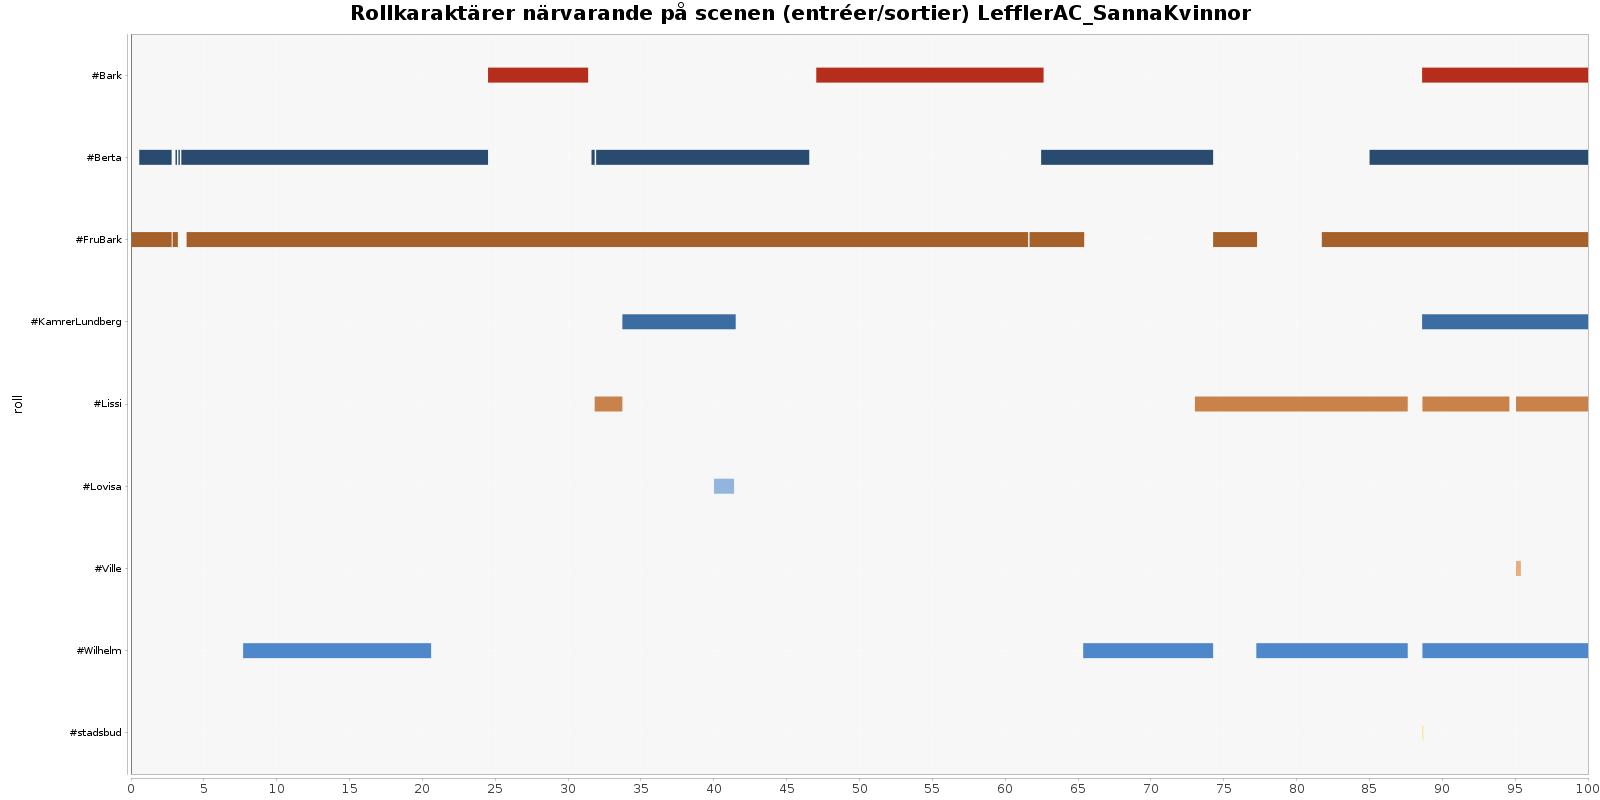 [Diagram över närvaro enligt förloppets entréer/sortier i Sanna kvinnor.]